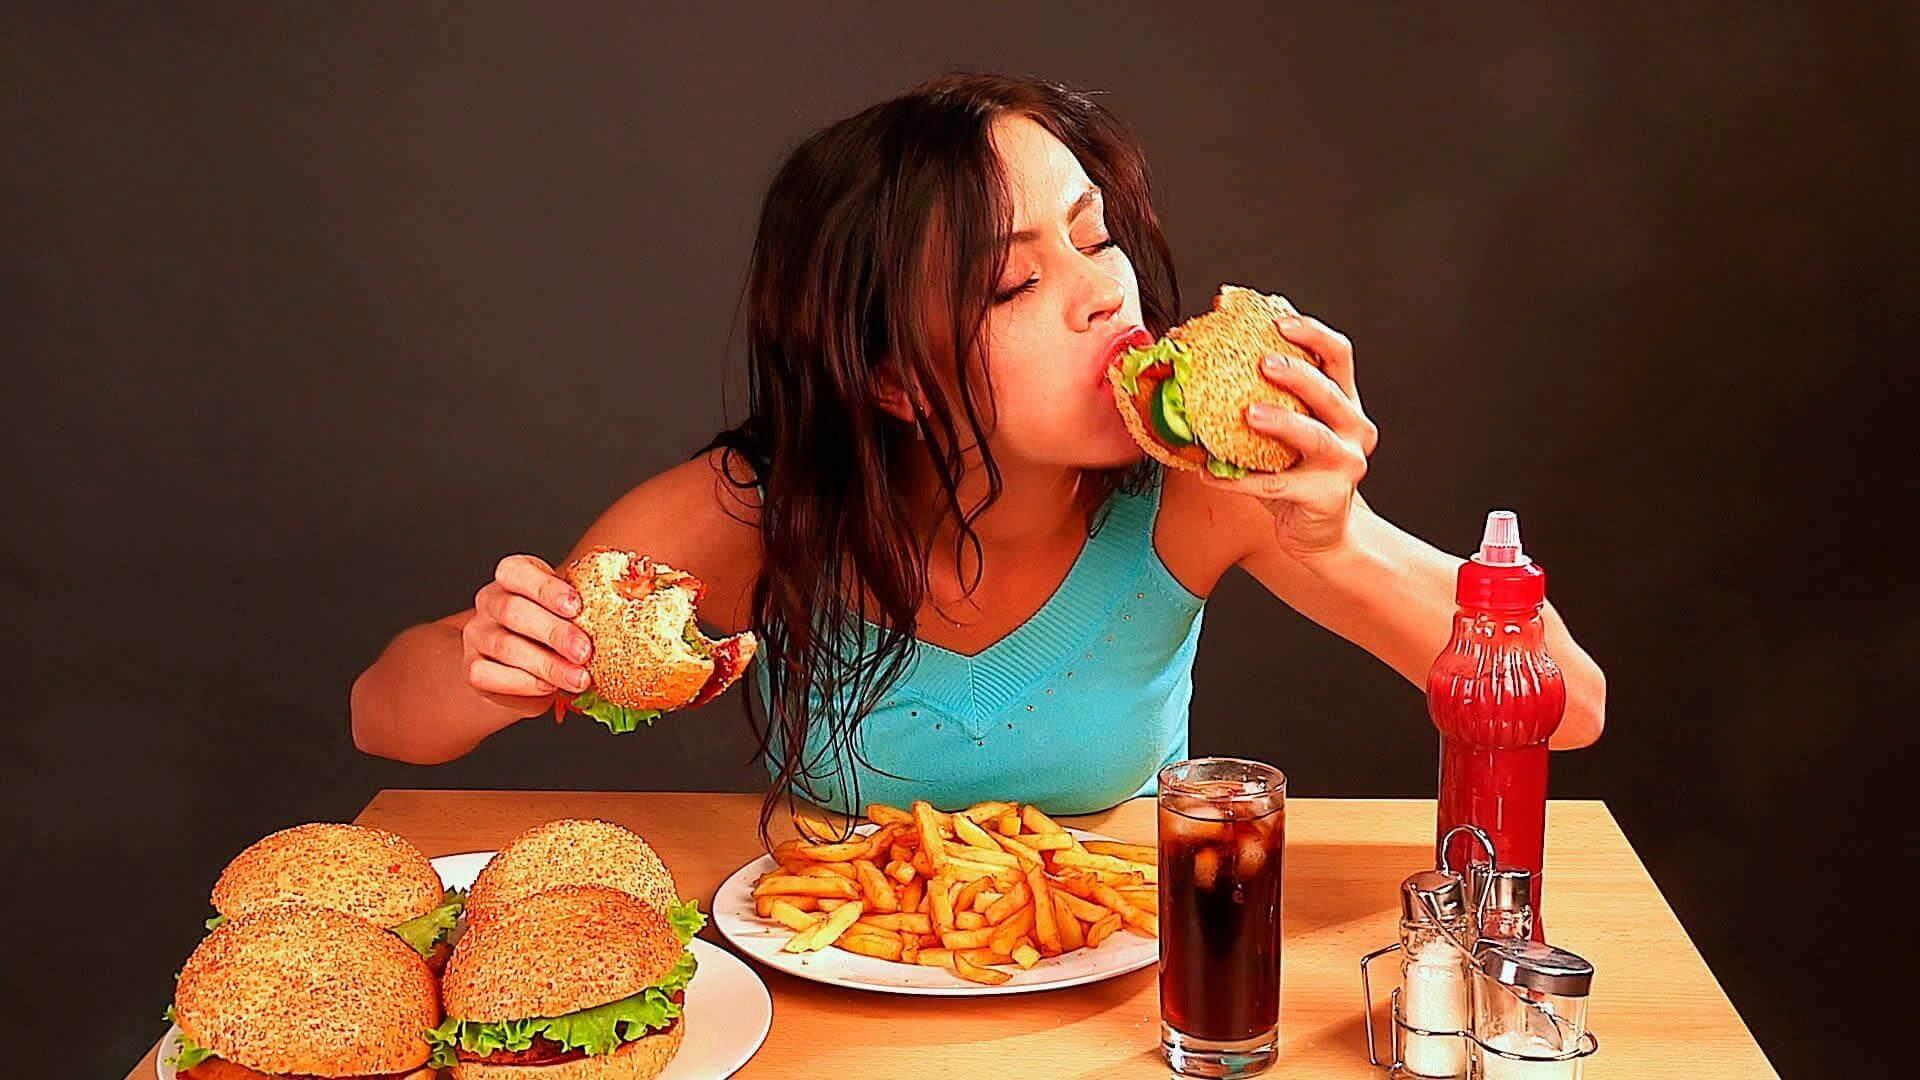 deli gibi fast food yemek